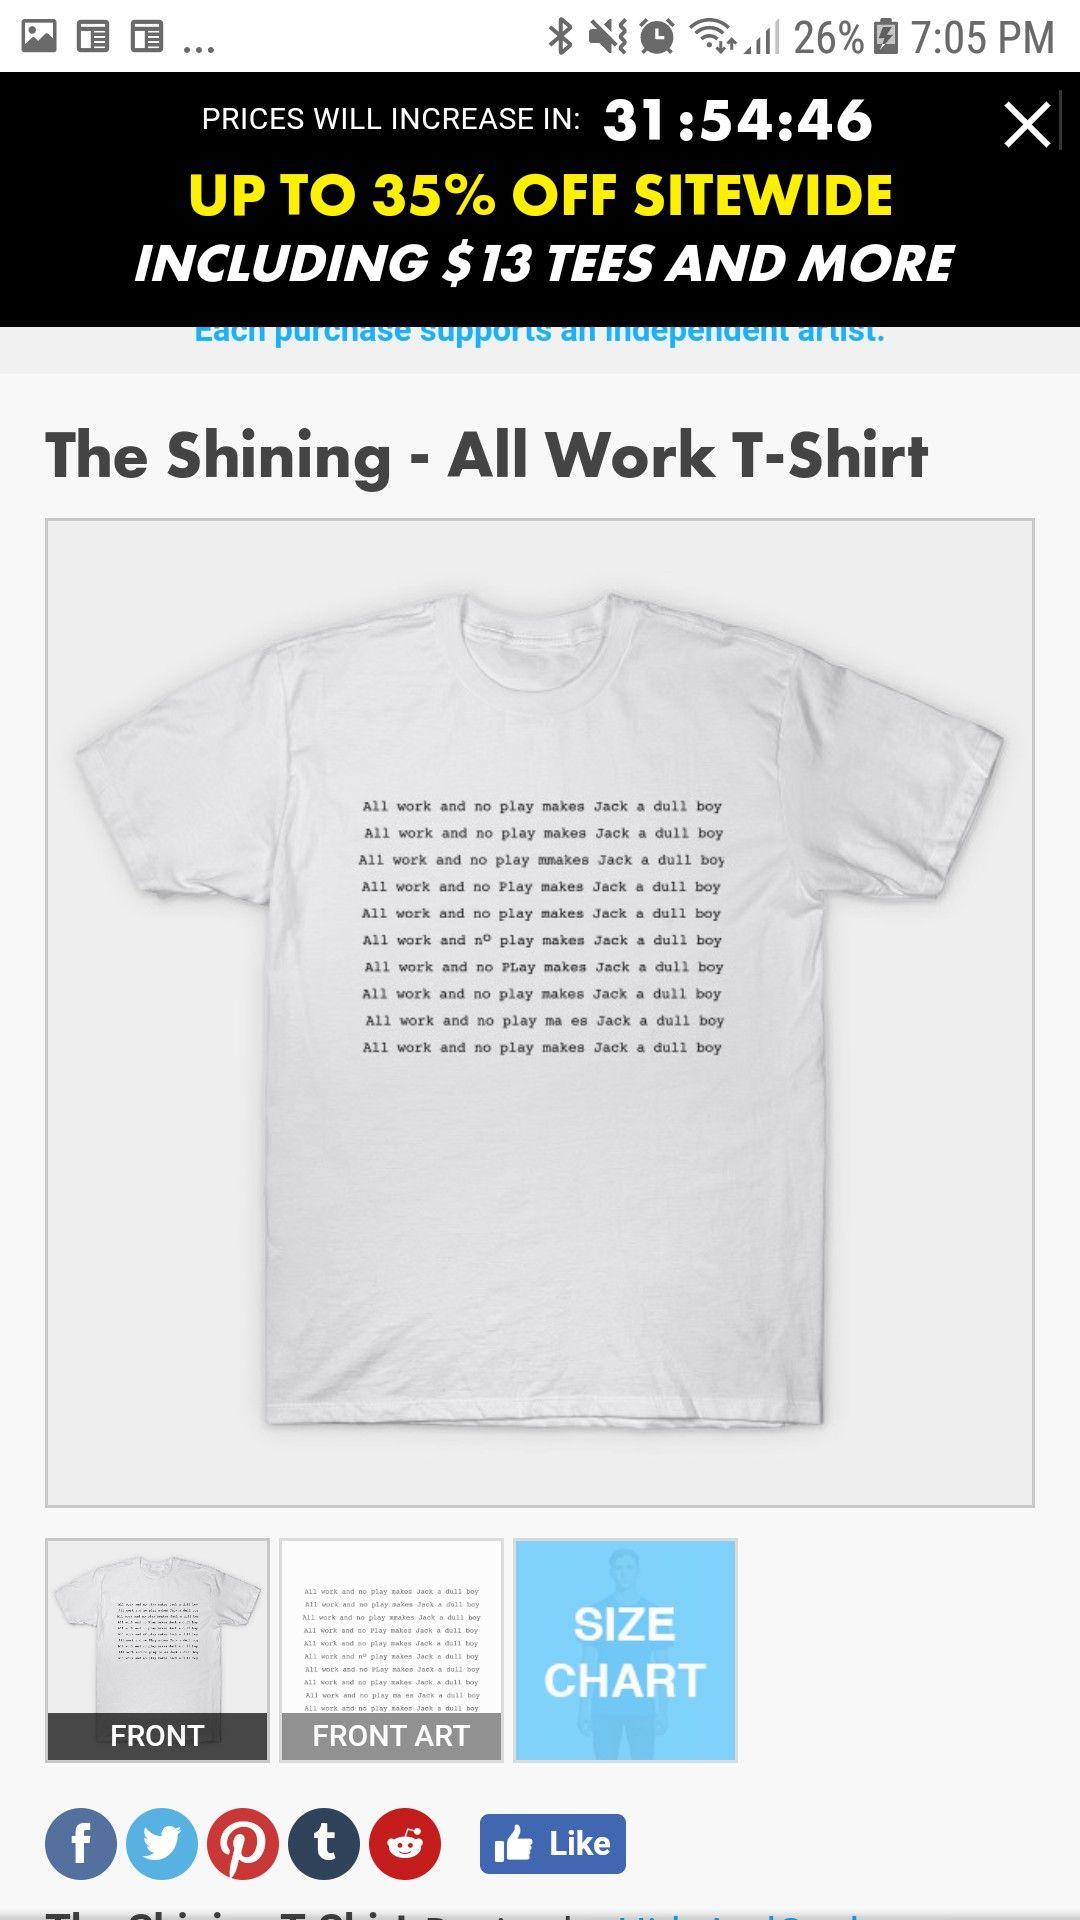 Mens Tops By Renee On Tee Public Mens Tshirts T Shirt